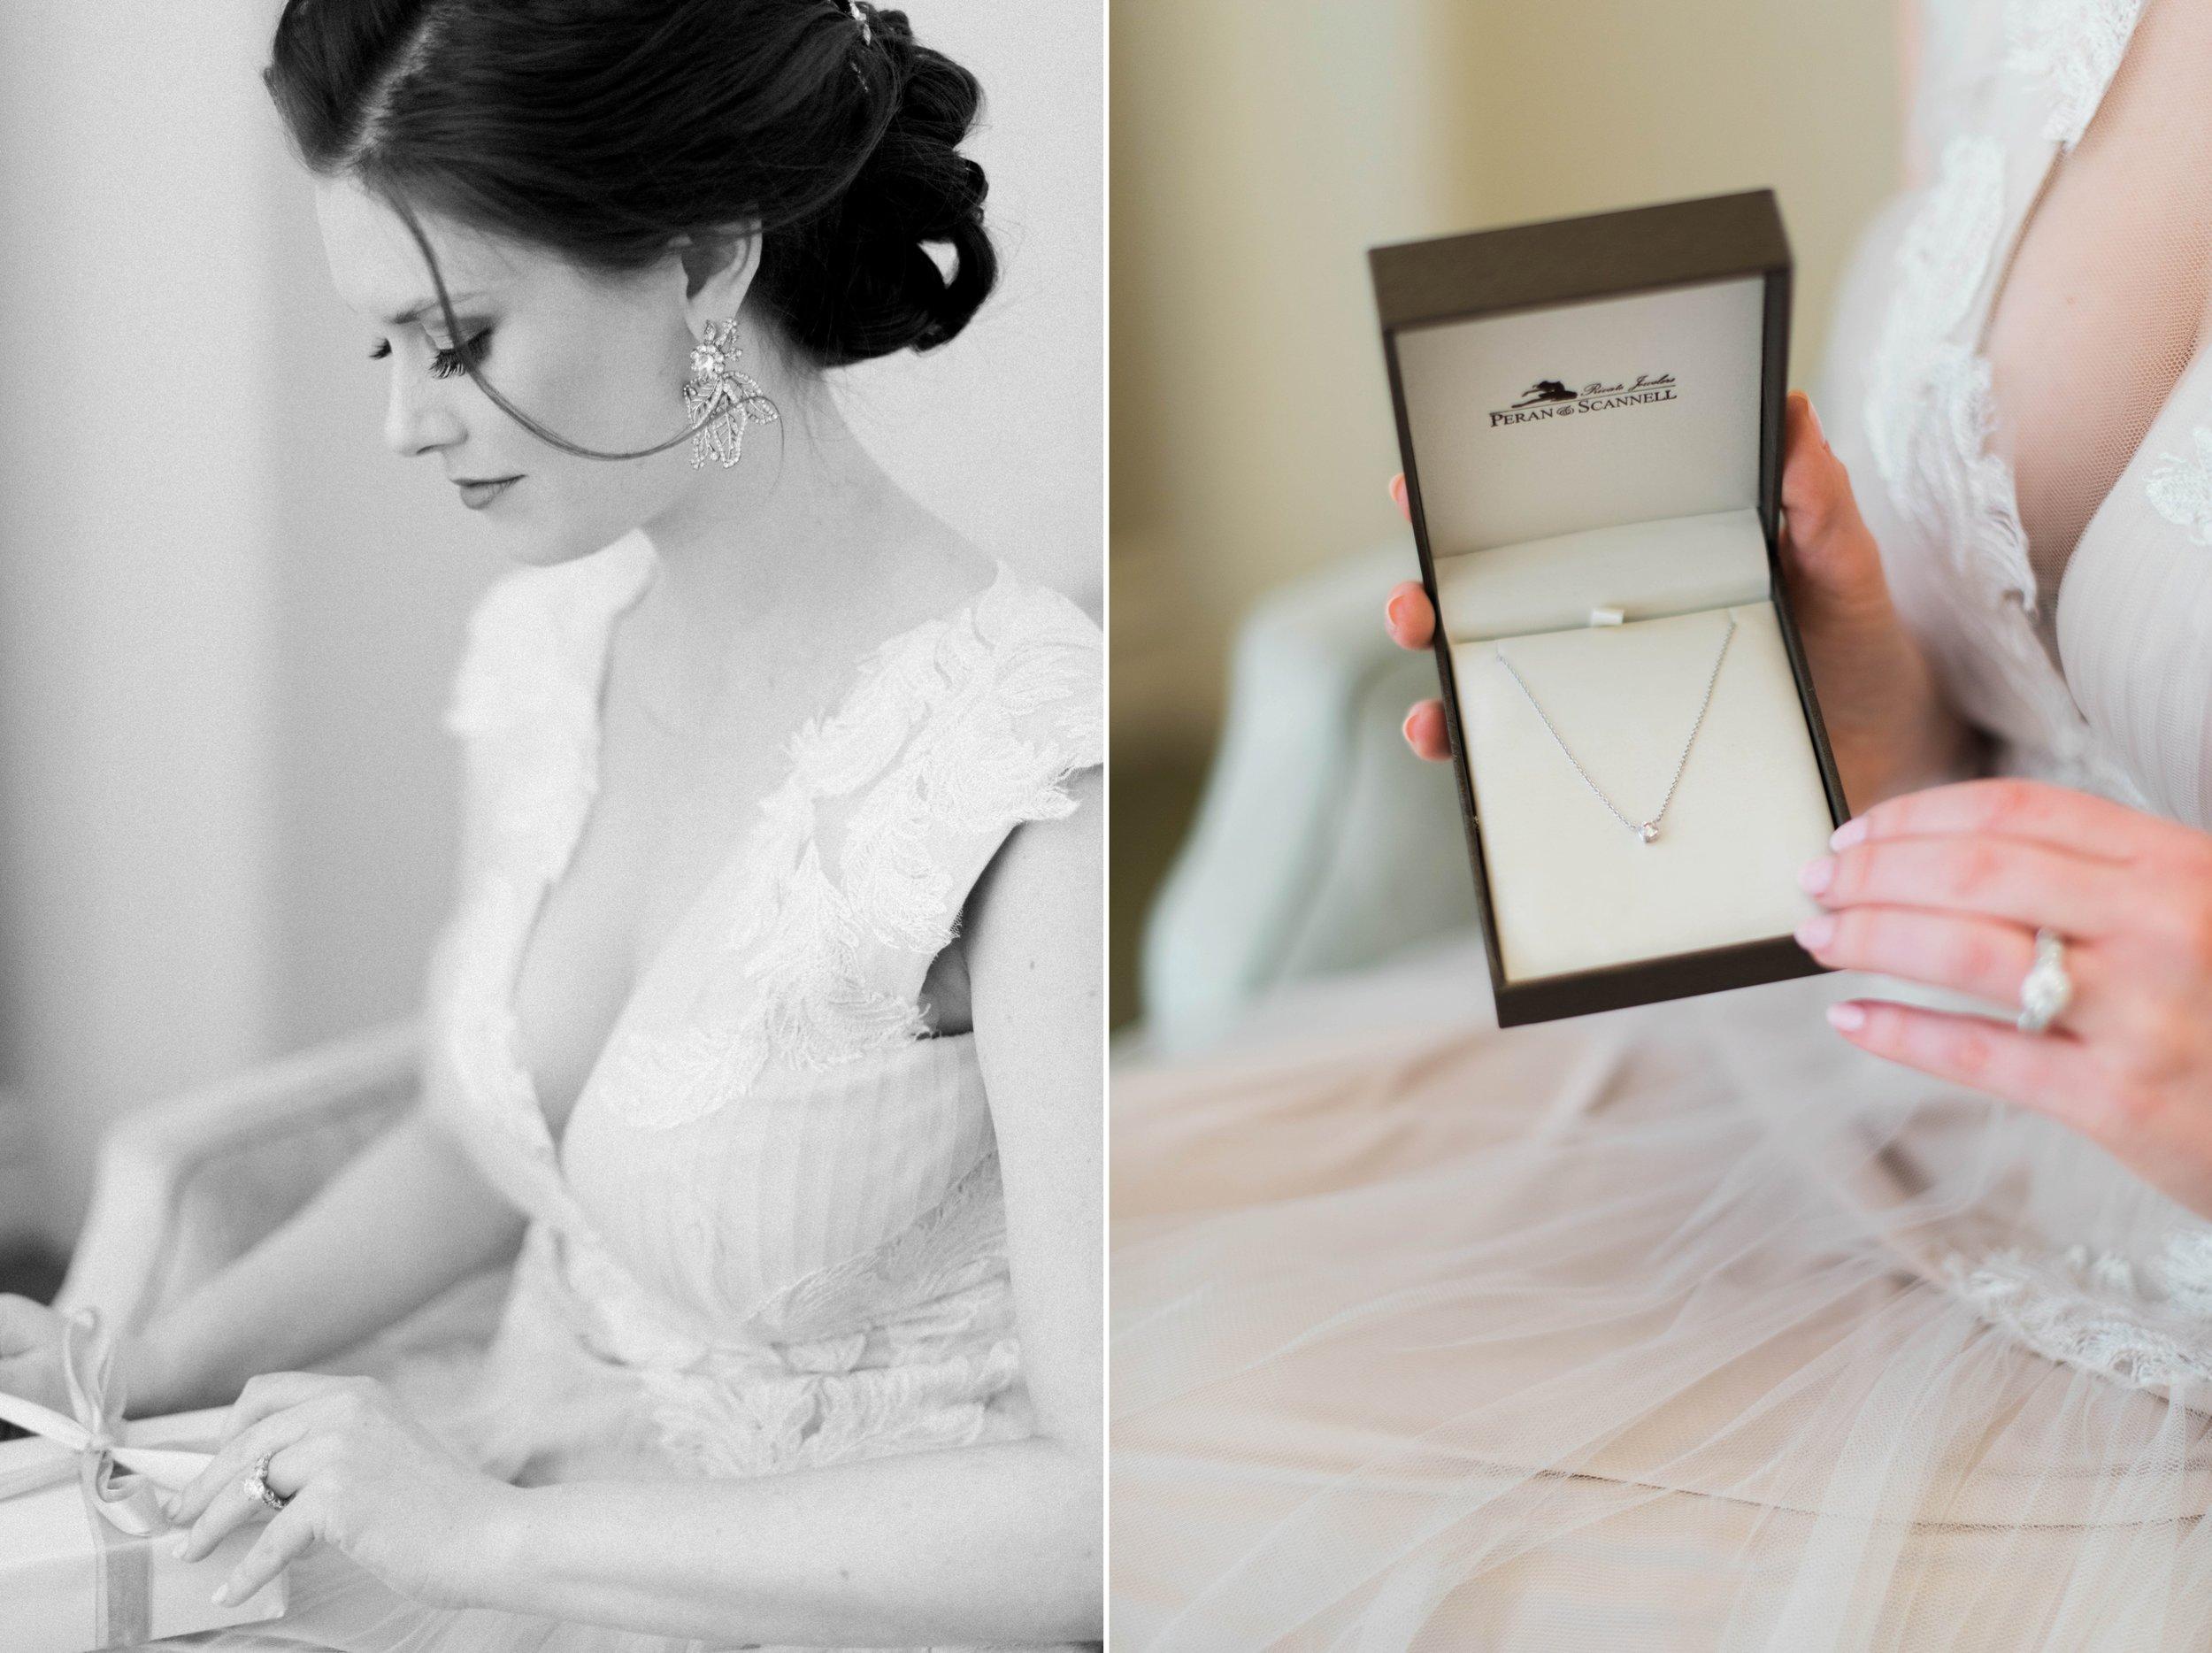 Houston-Wedding-Photographer-Lakeside-Country-Club-First-Look-Bride-Groom-Formals-Film-Fine-Art-Photography-4205.jpg